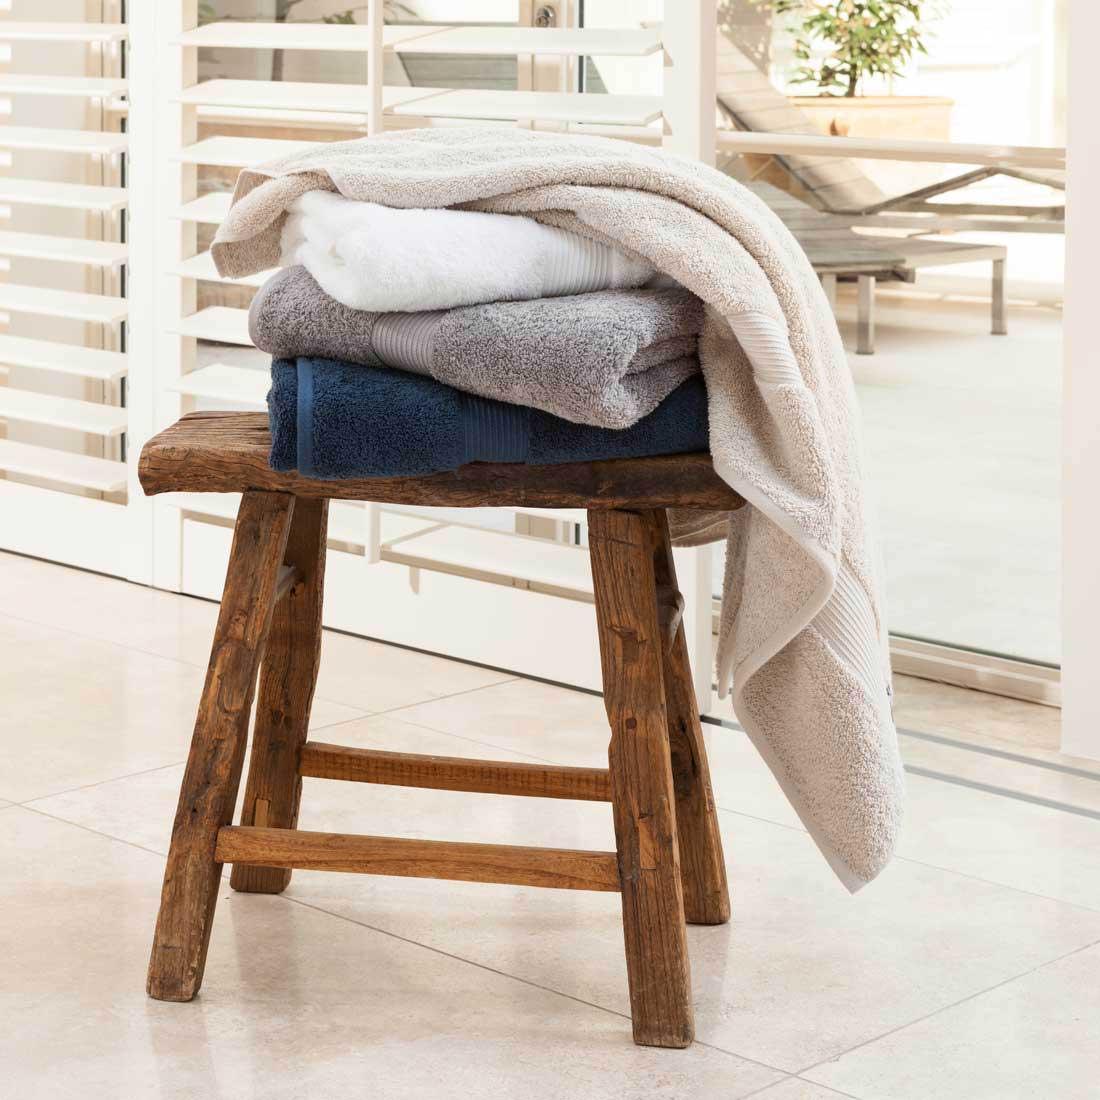 Canningvale Royale Towels - bathroom luxury